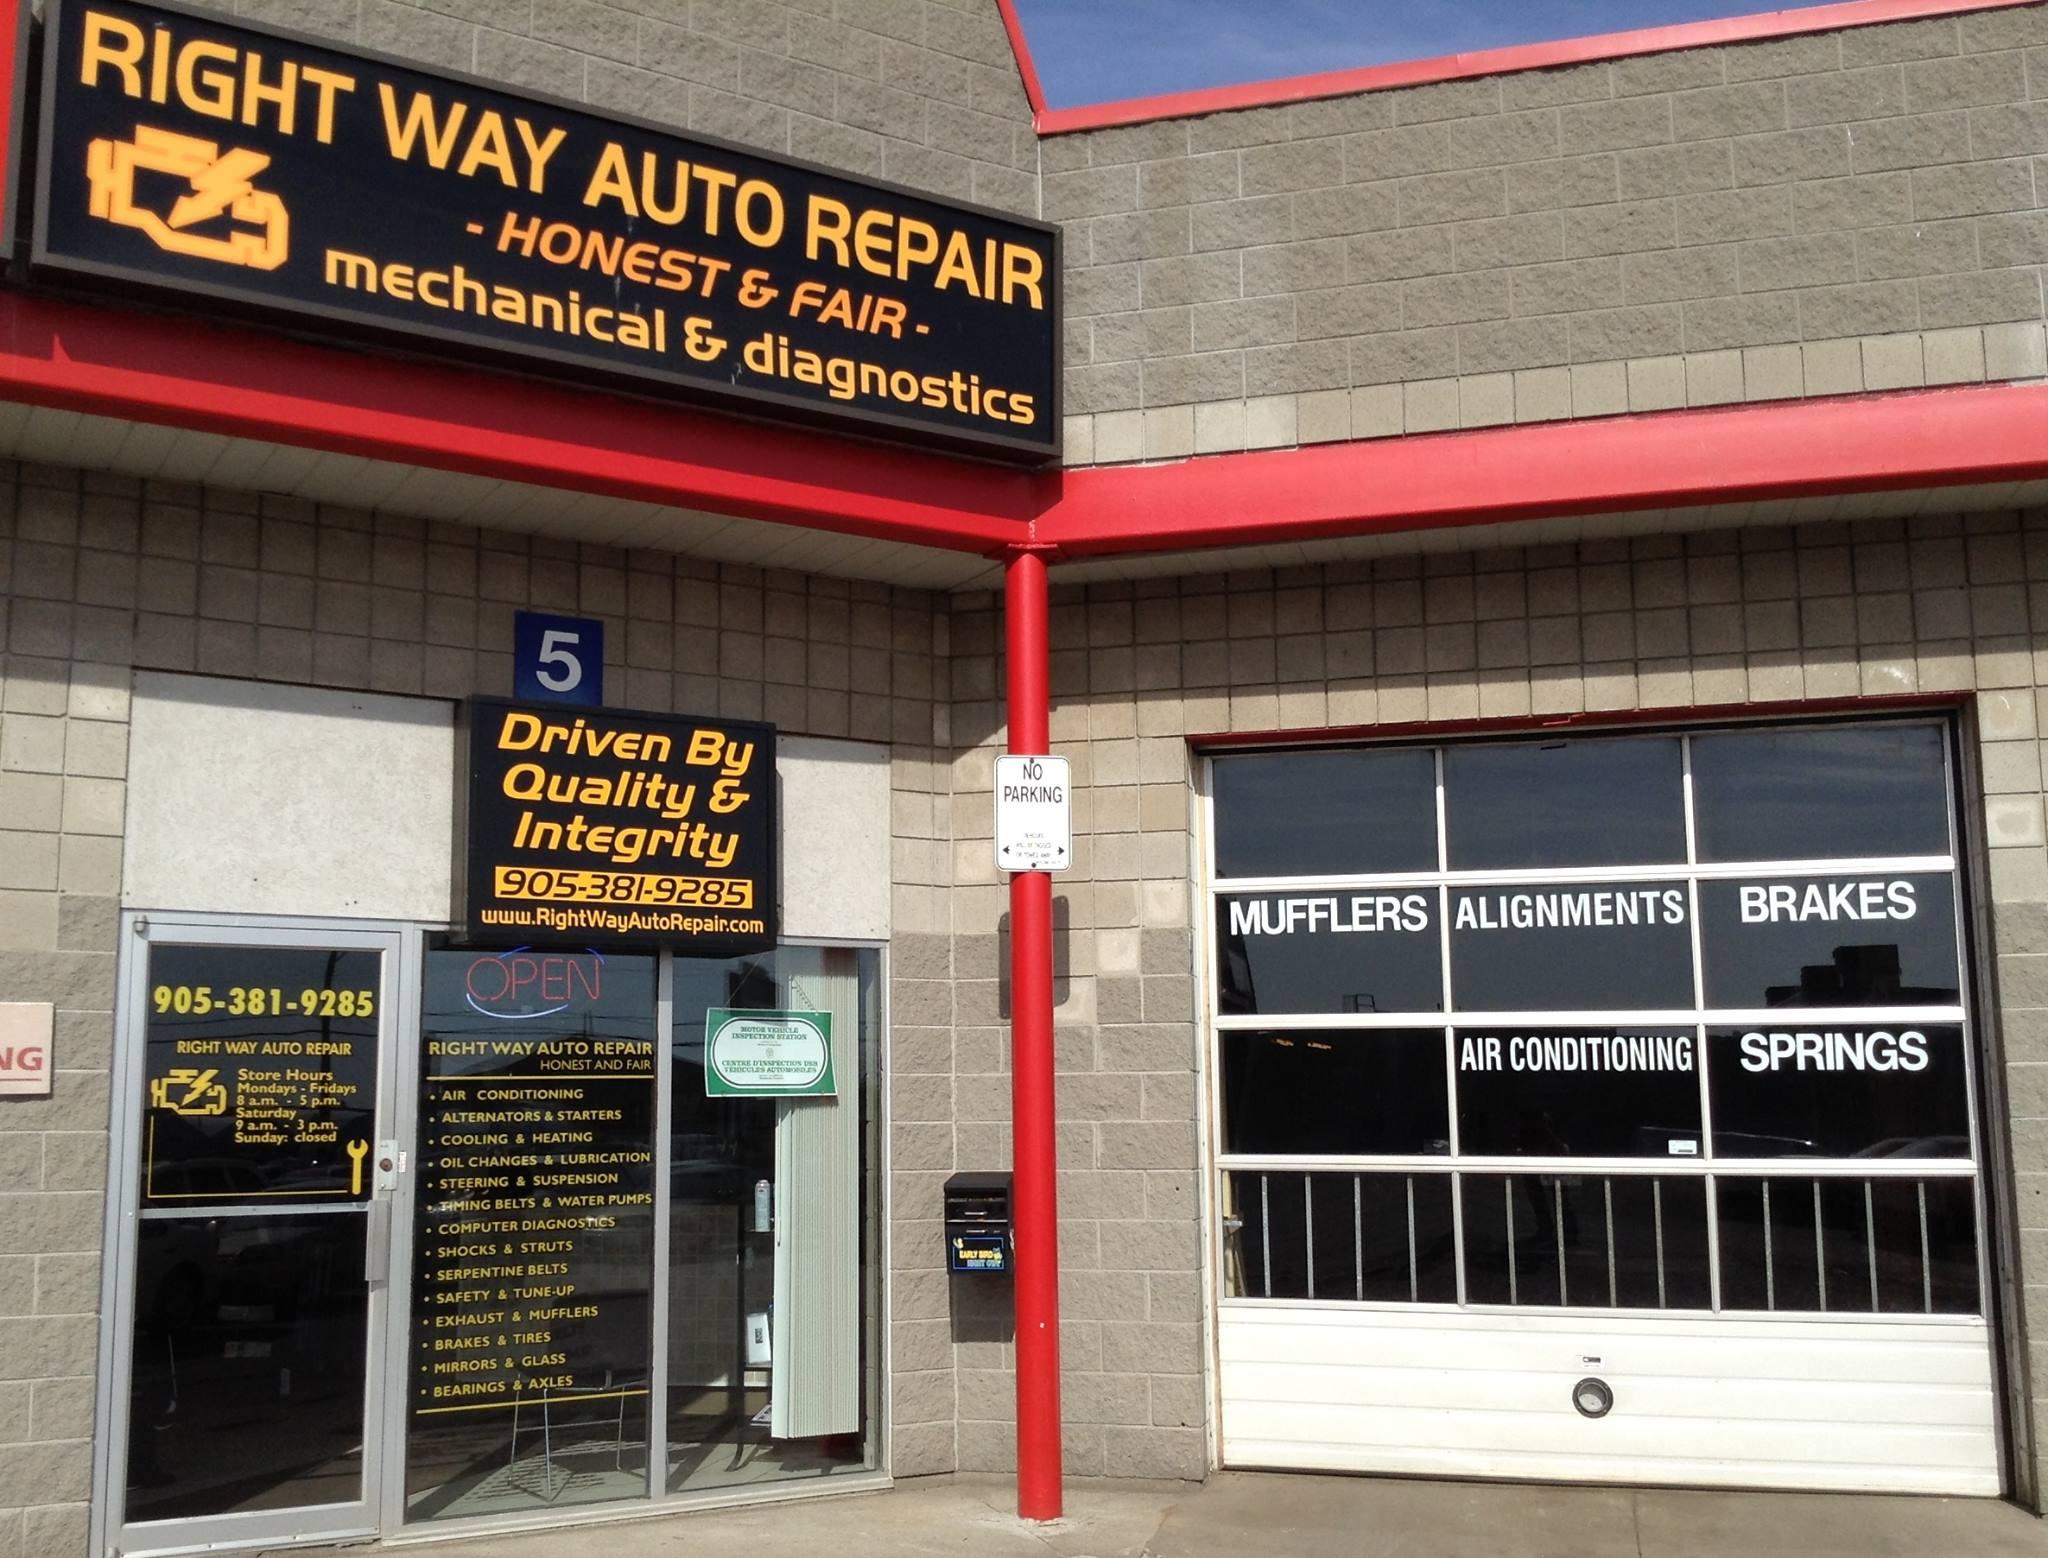 Right Way Auto Repair Hamilton, Canada